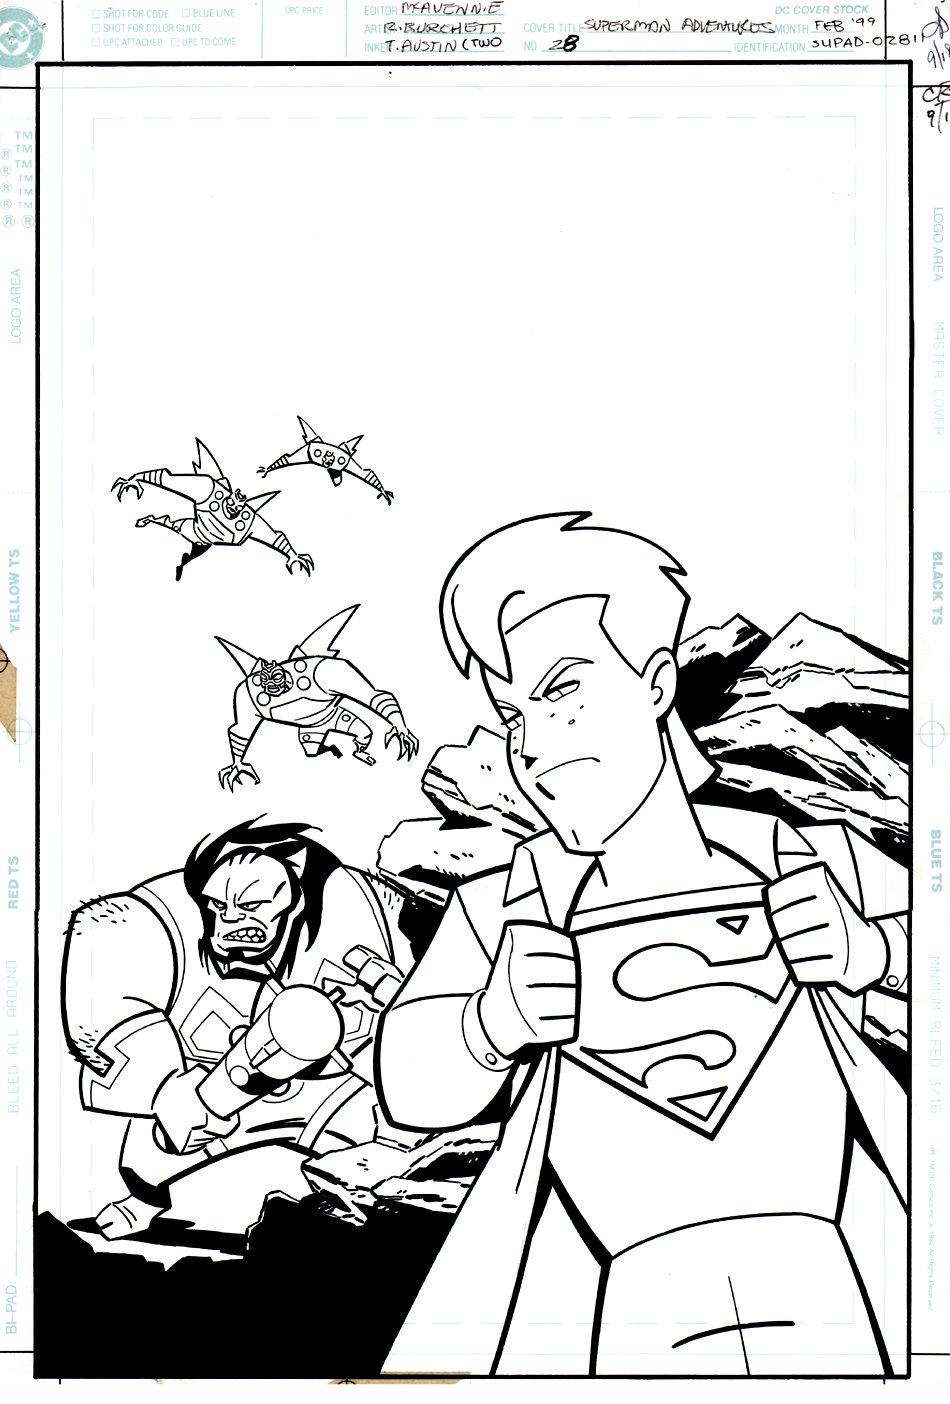 Superman Adventures #28 Cover (1998)